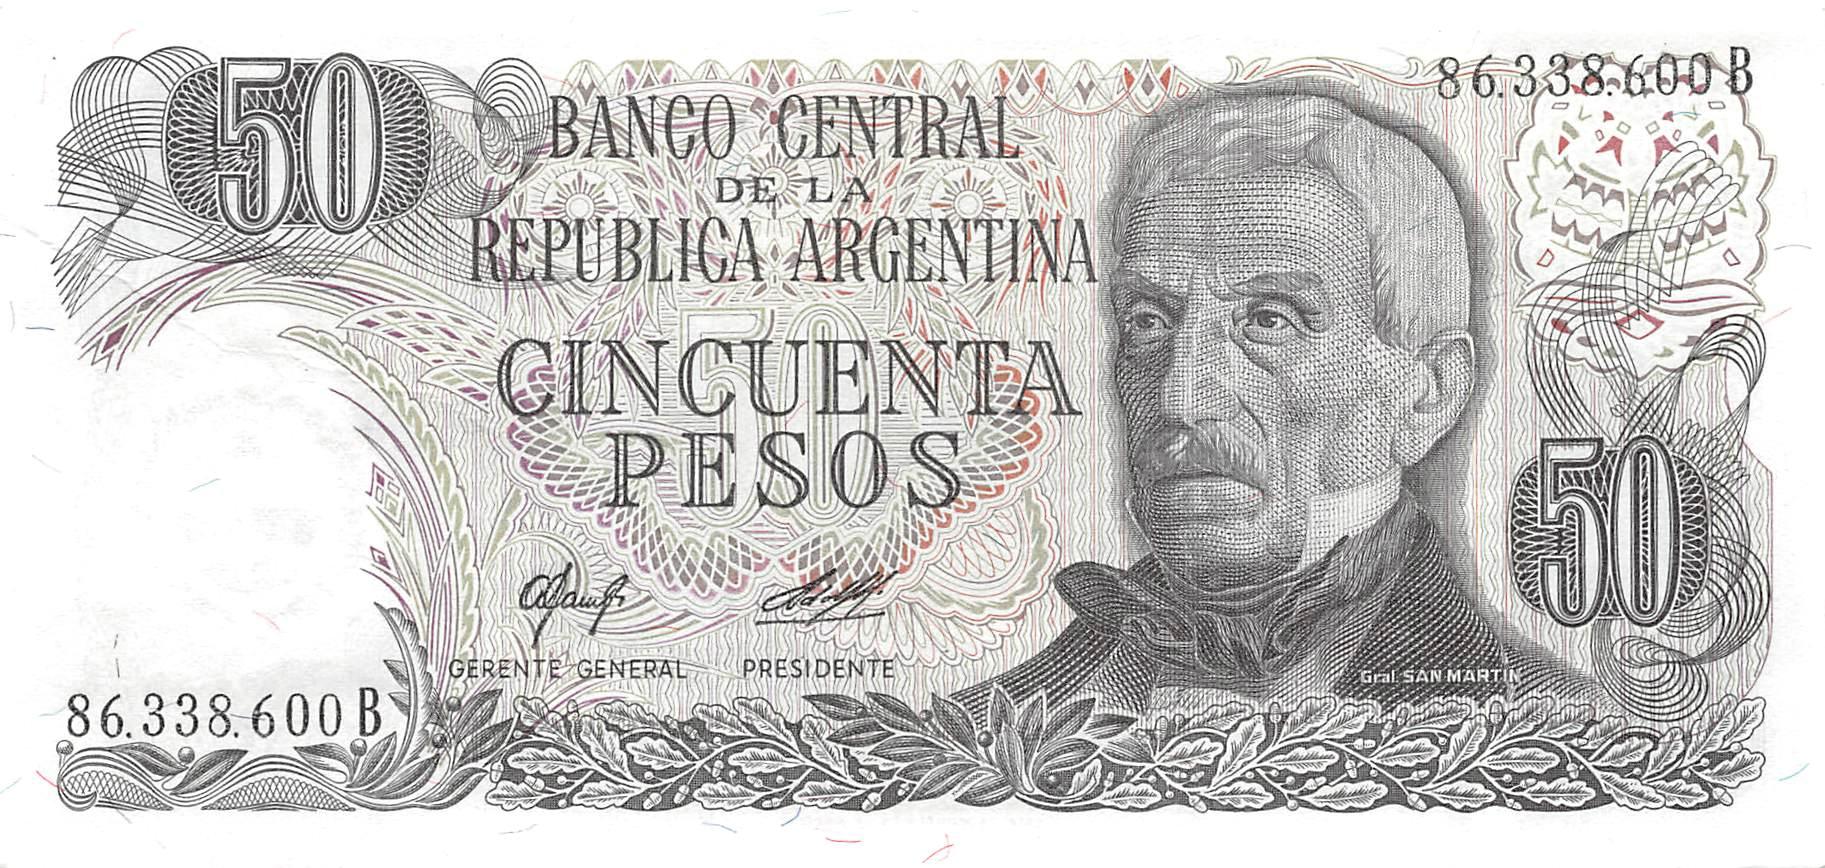 ARGENTINA 2 PESOS 2006 EMERGENCY NOTE P NL UNC